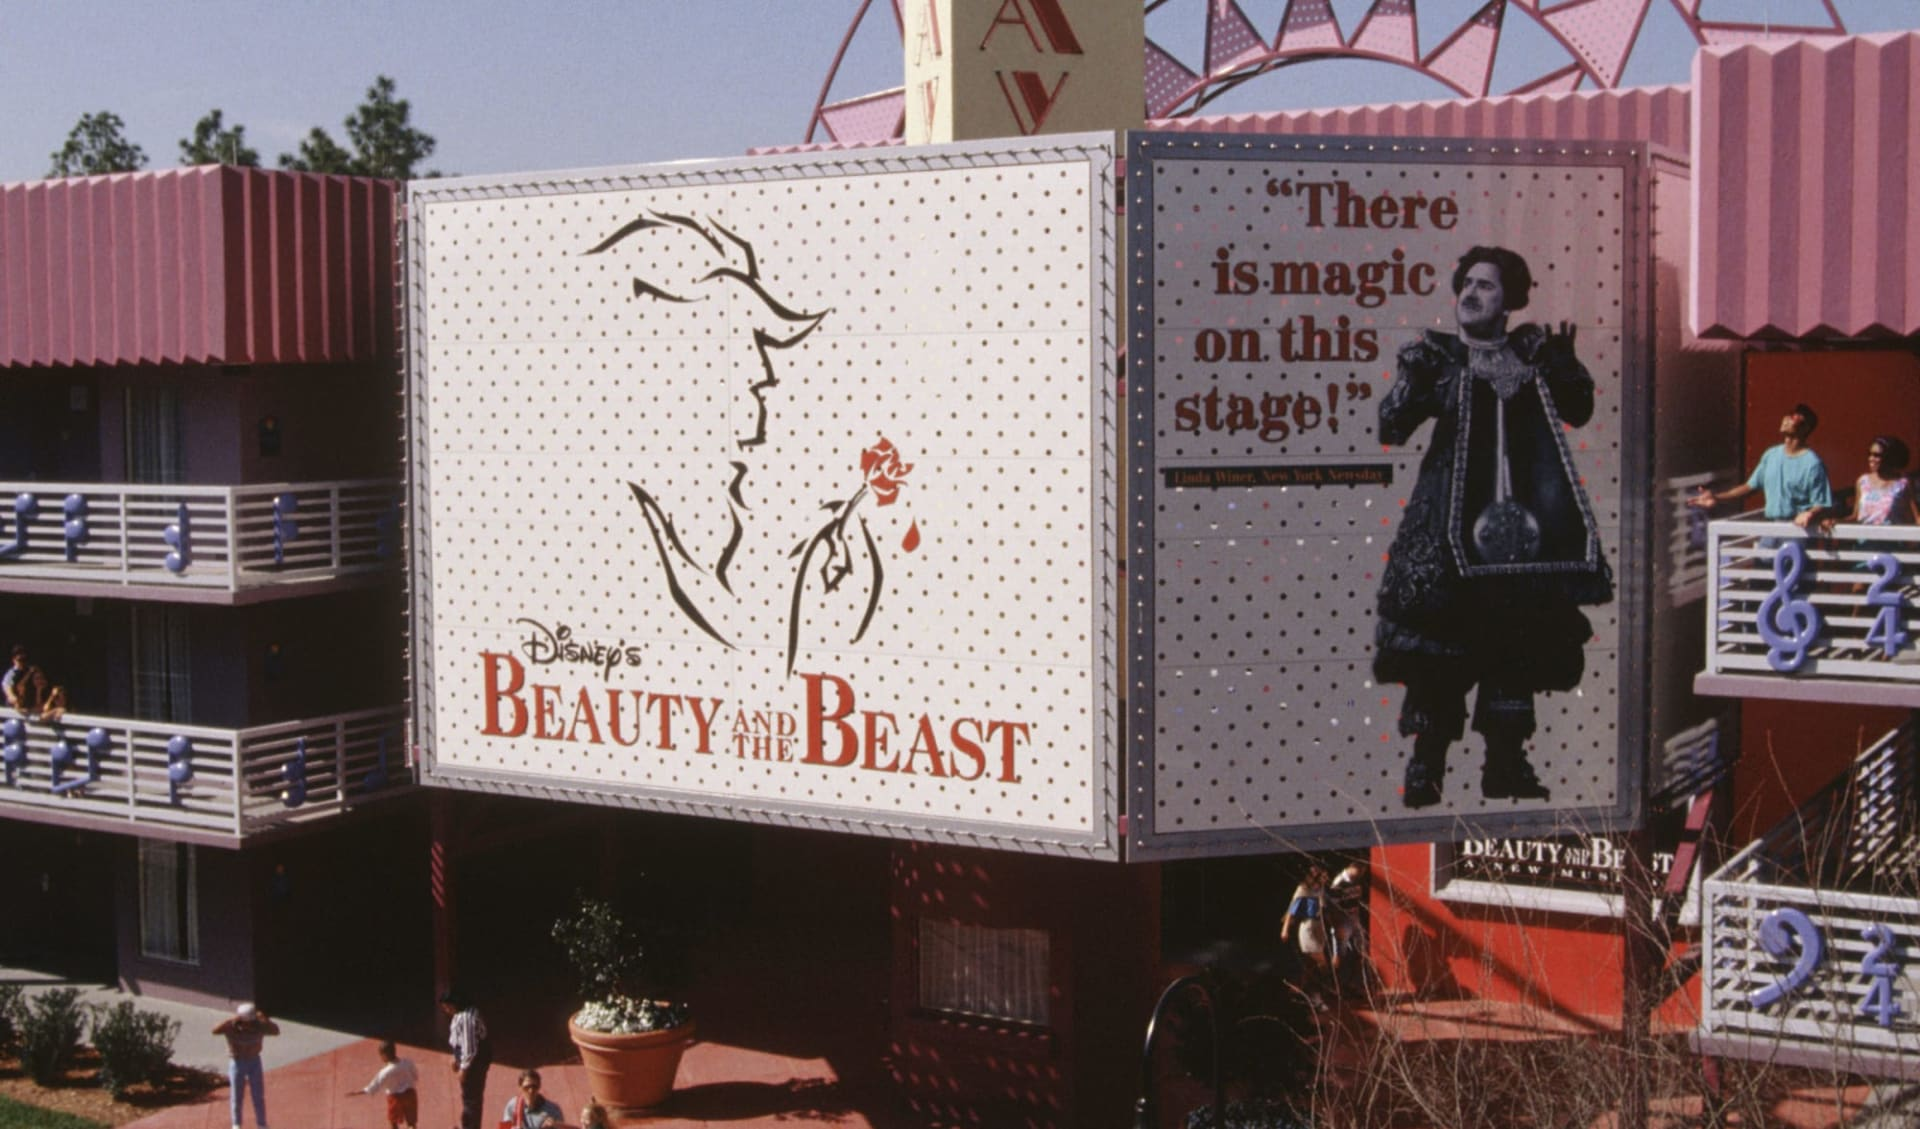 Disney's All Star Music Resort in Lake Buena Vista: All Star Music_Disney_Orlando - Broadway